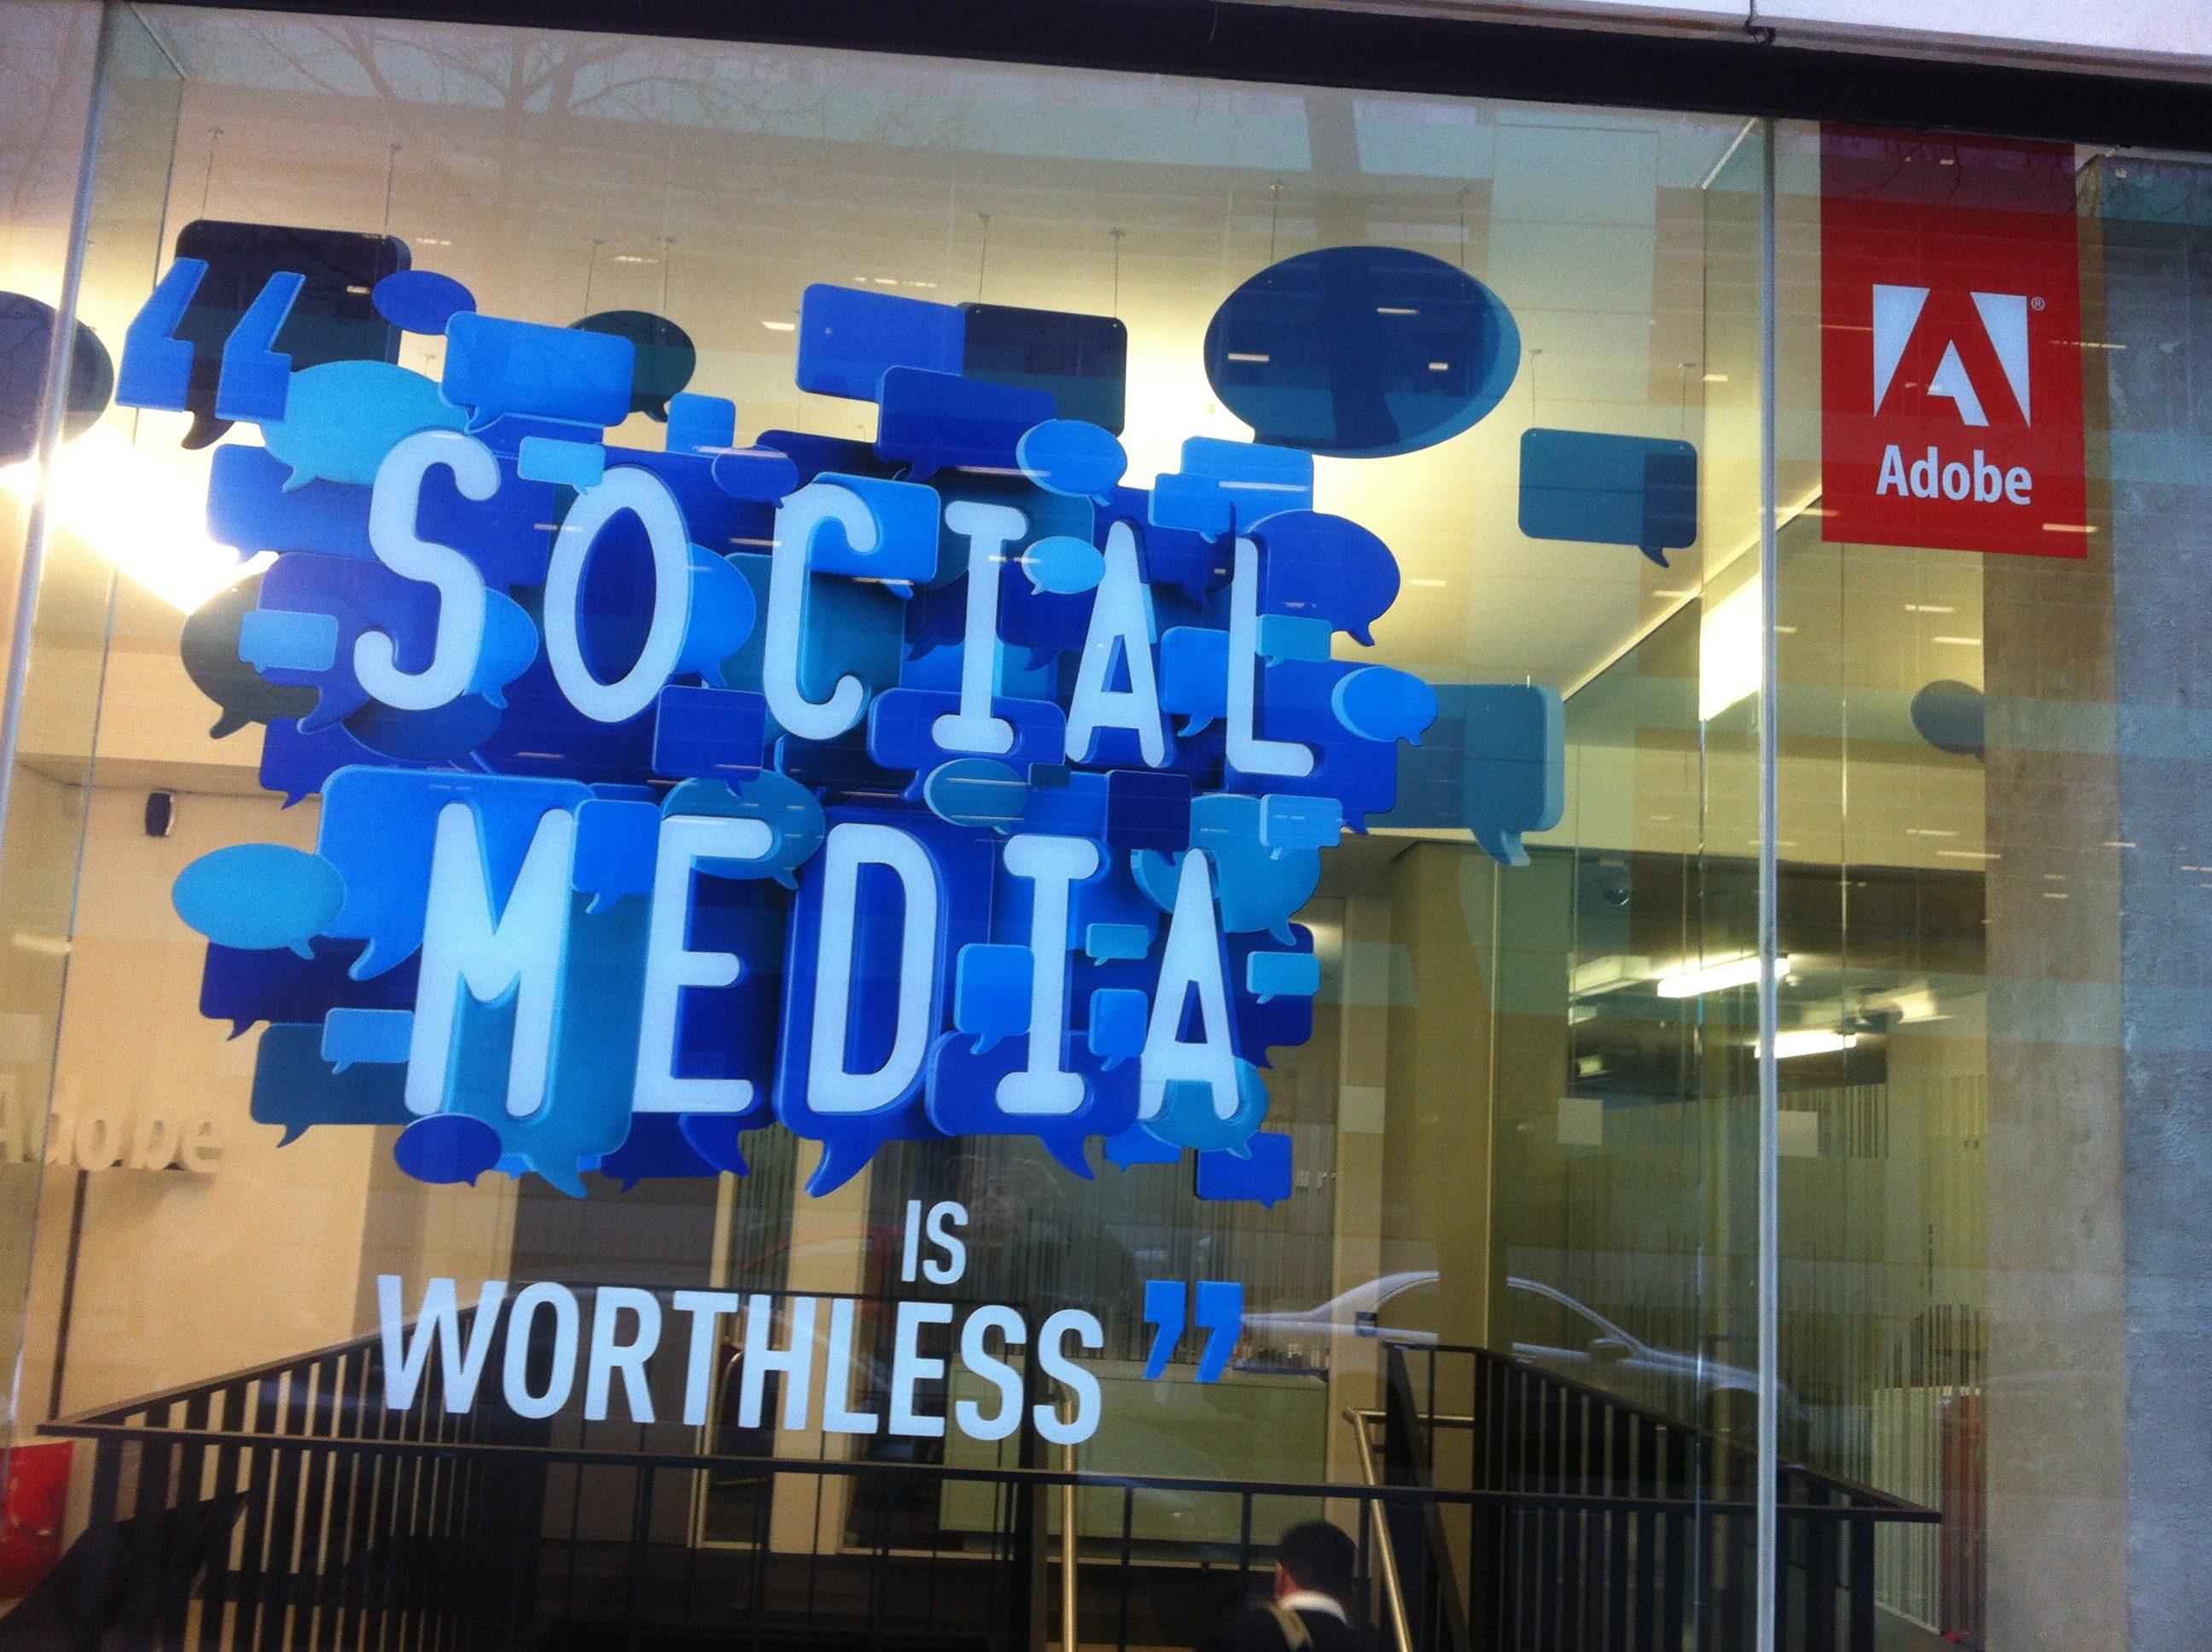 Adobe Social Media is Worthless, The Myndset Digital Marketing and Brand Strategy